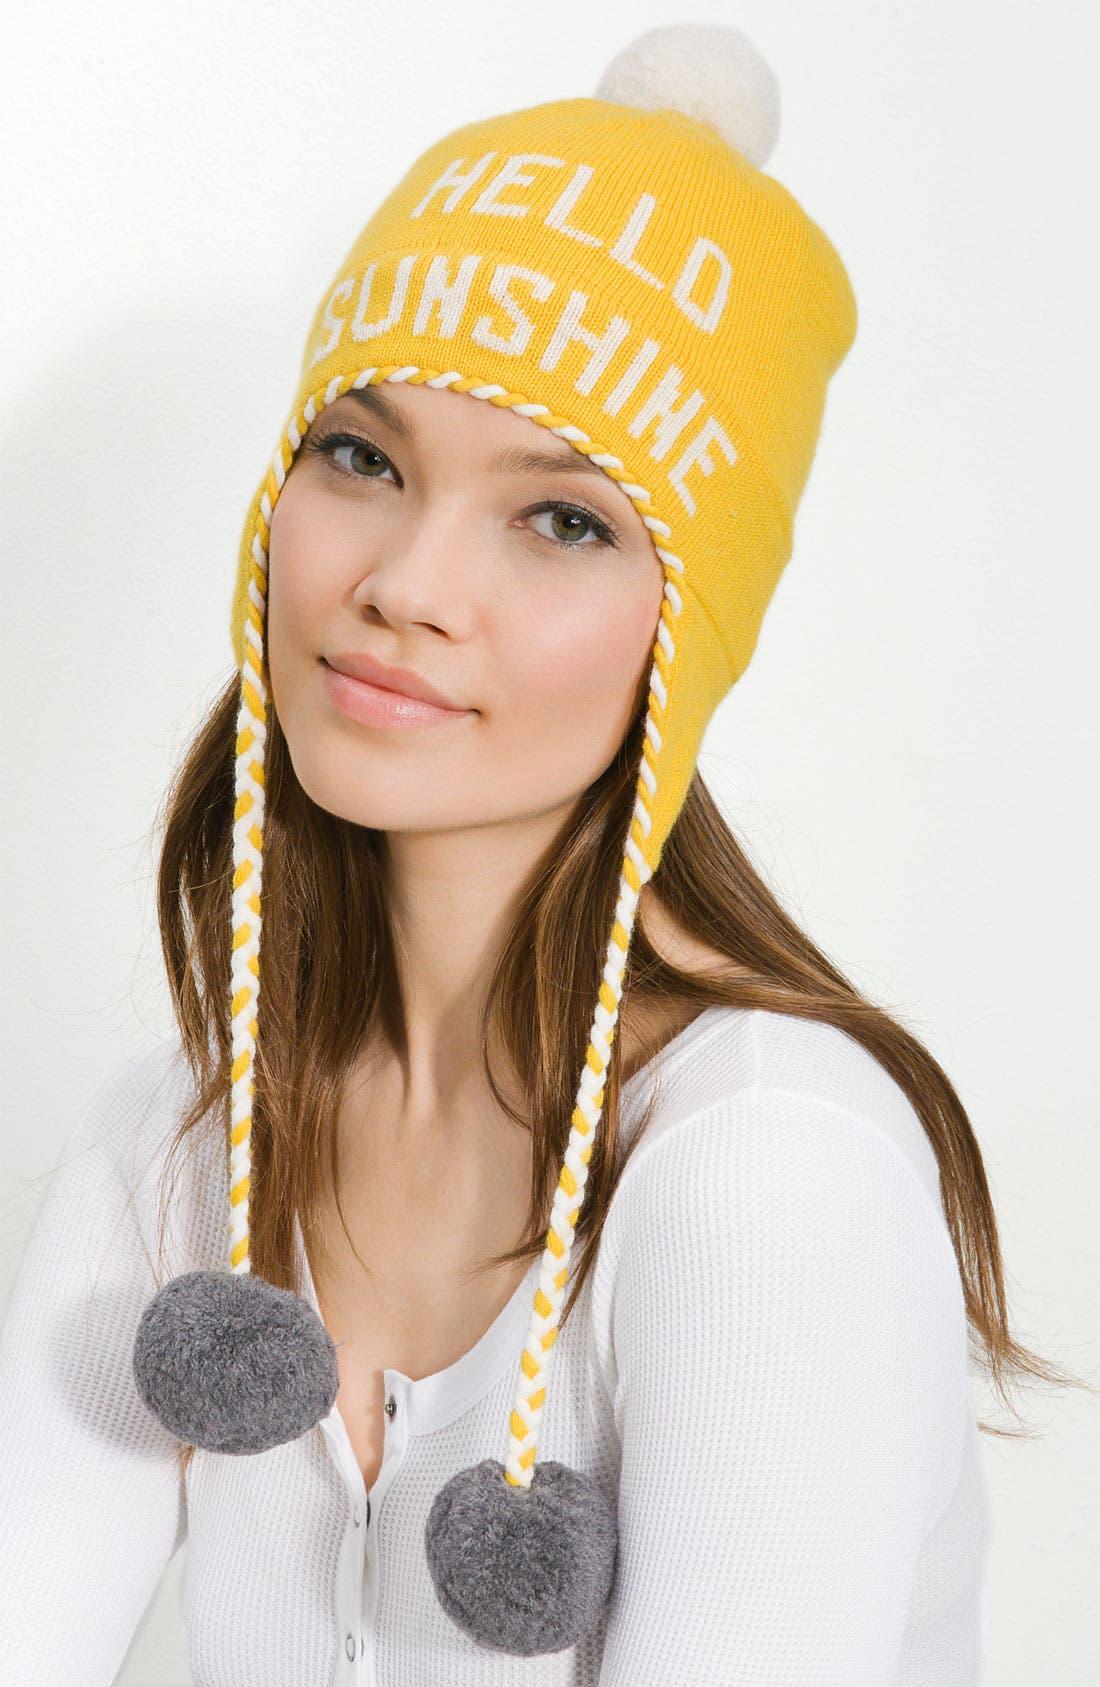 Alternate Image 1 Selected - kate spade new york 'hello sunshine' ski hat